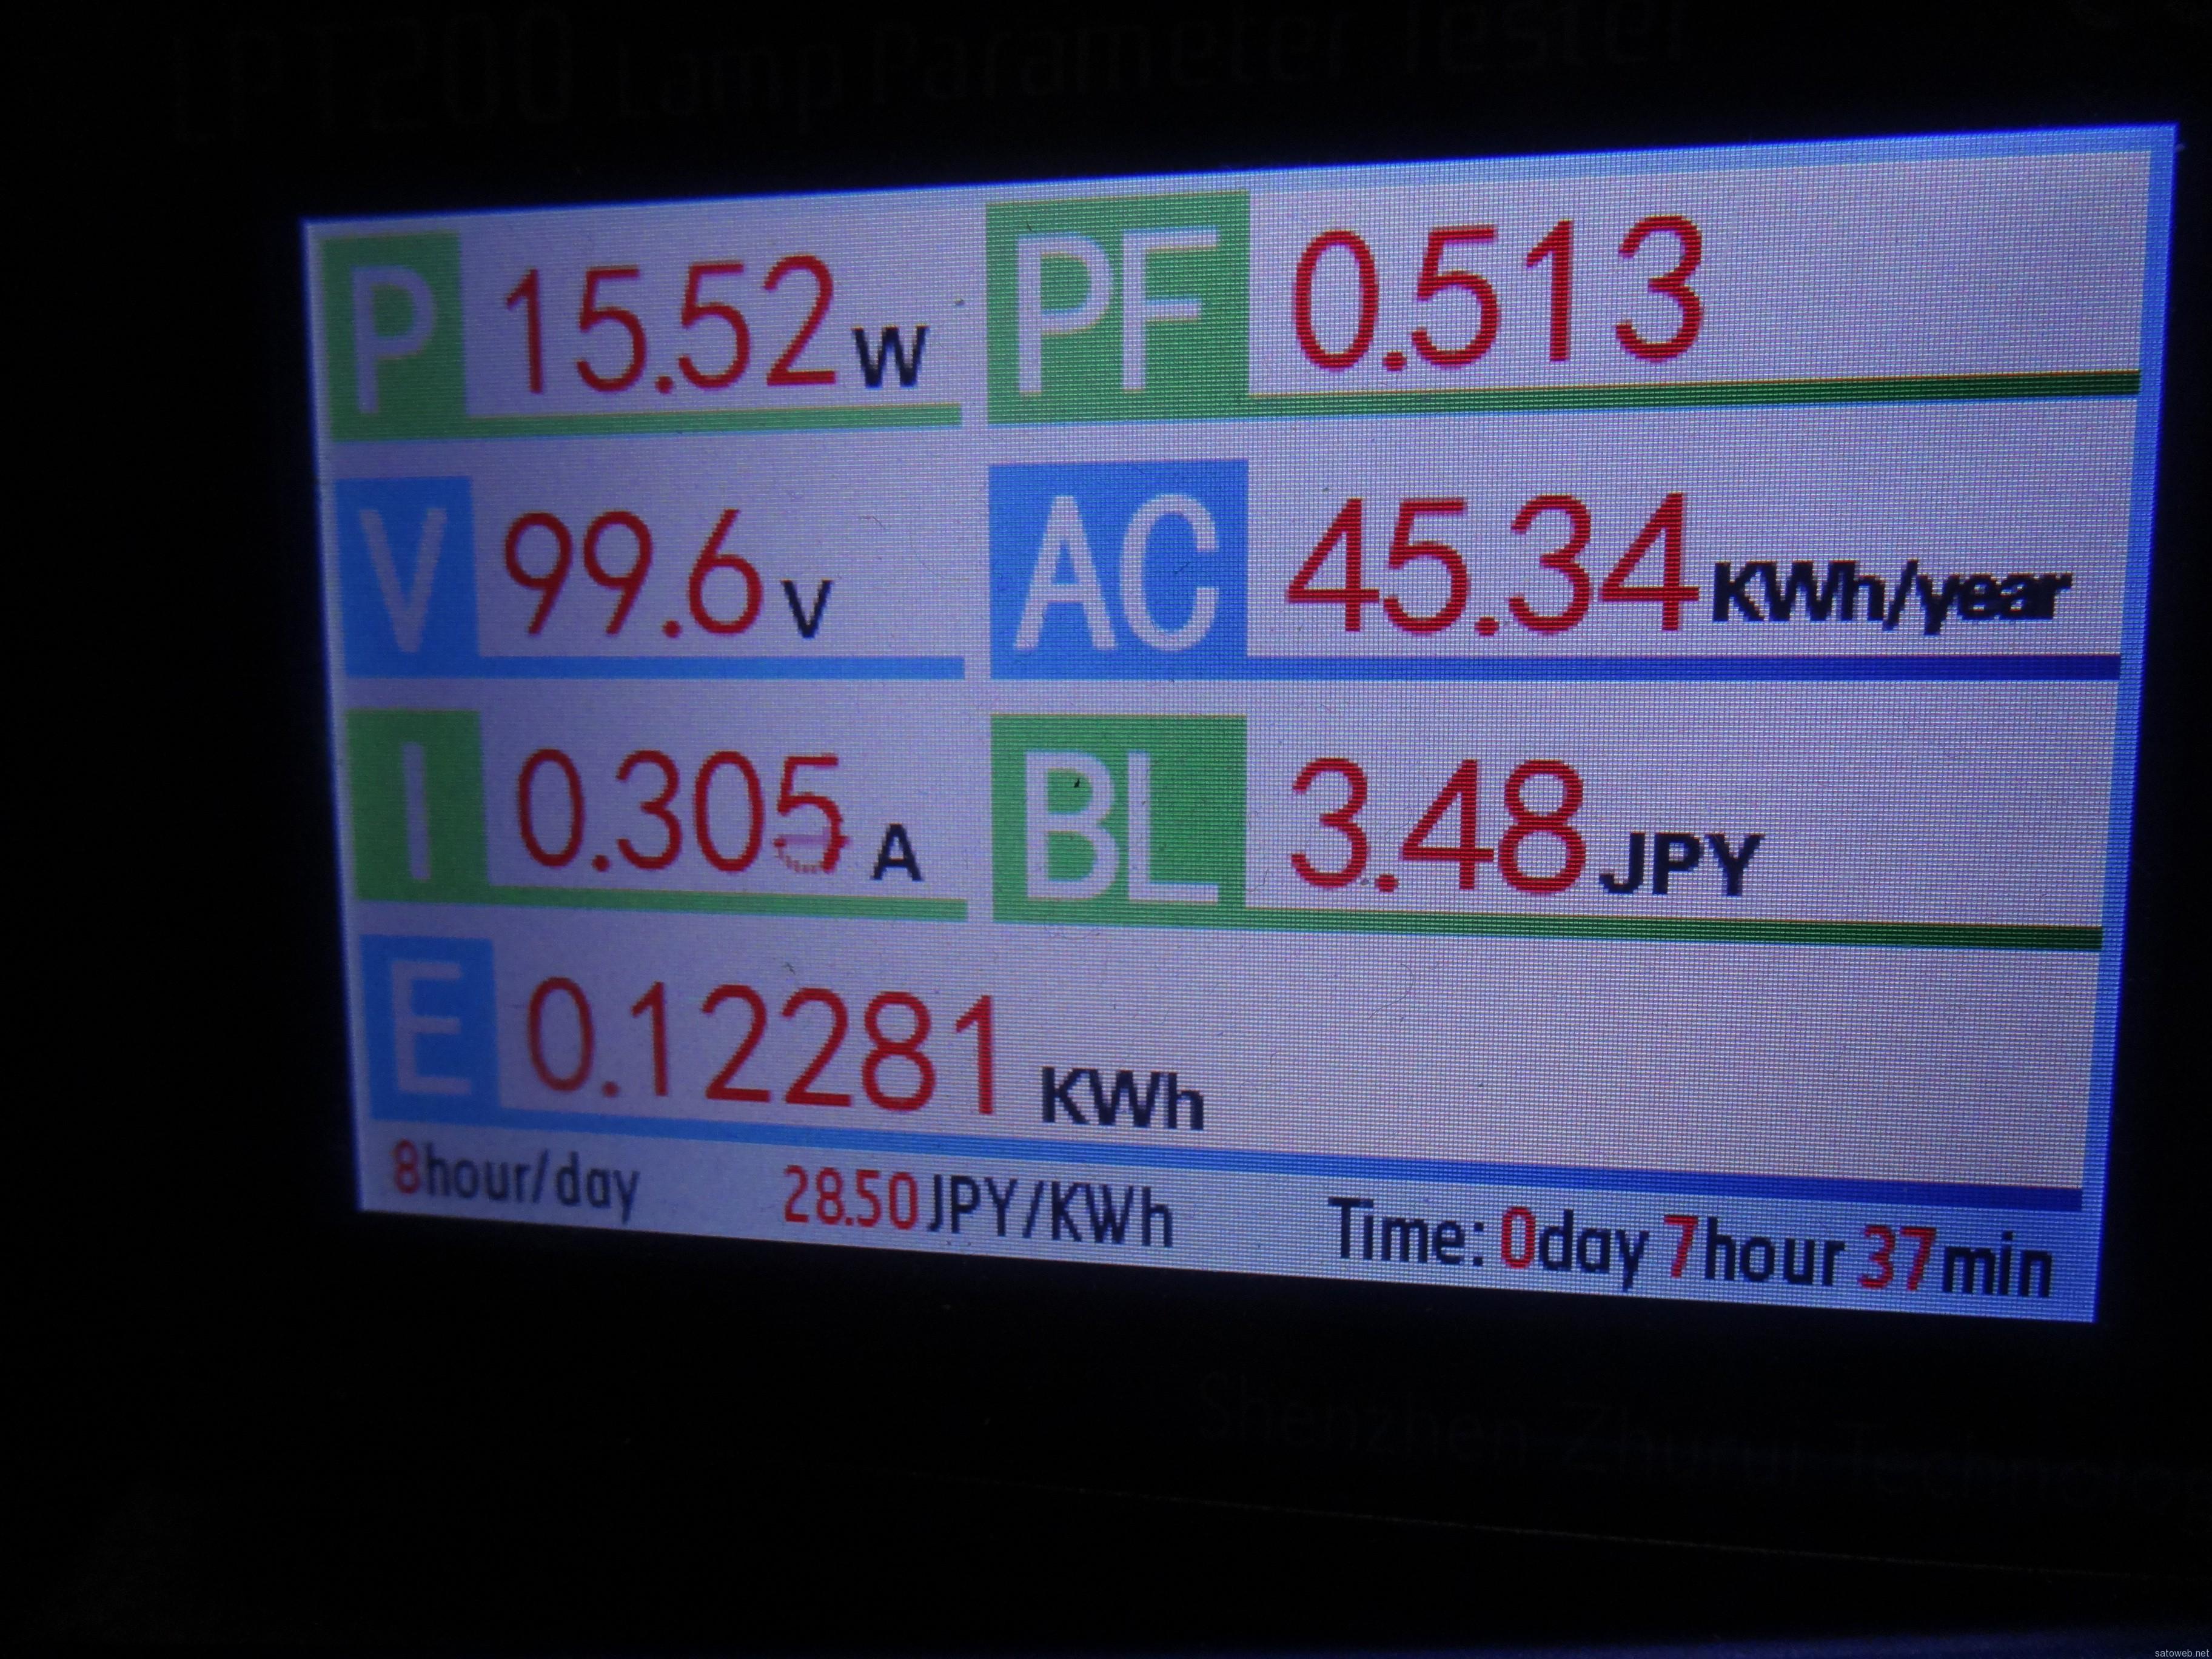 Anker 60W USBチャージャーの過負荷時の挙動を検証してみる、